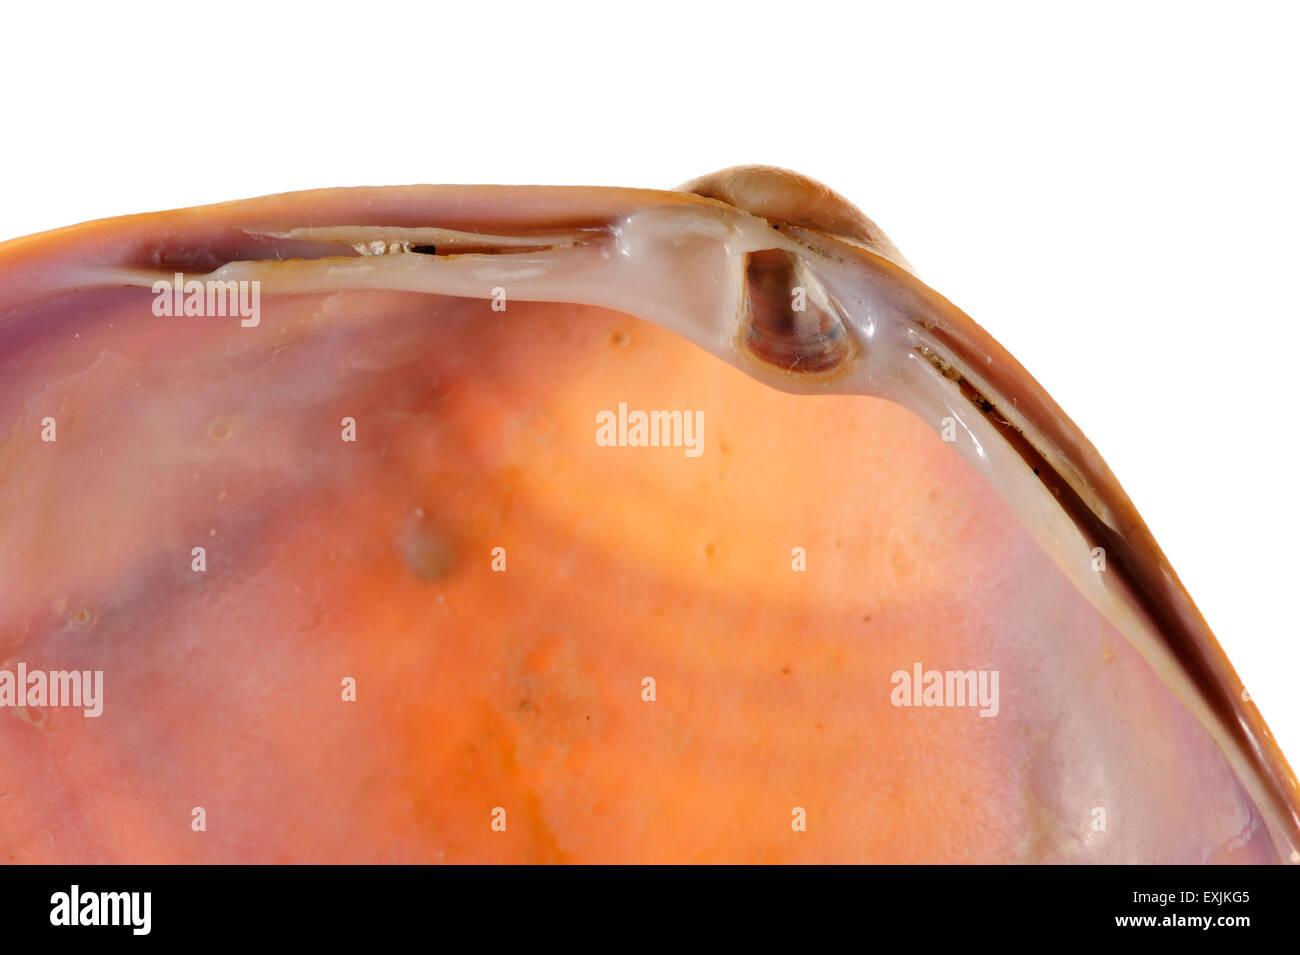 Rayed trough shell (Mactra stultorum cinerea / M. corallina cinerea) showing umbo, cardinal teeth, lateral teeth - Stock Image